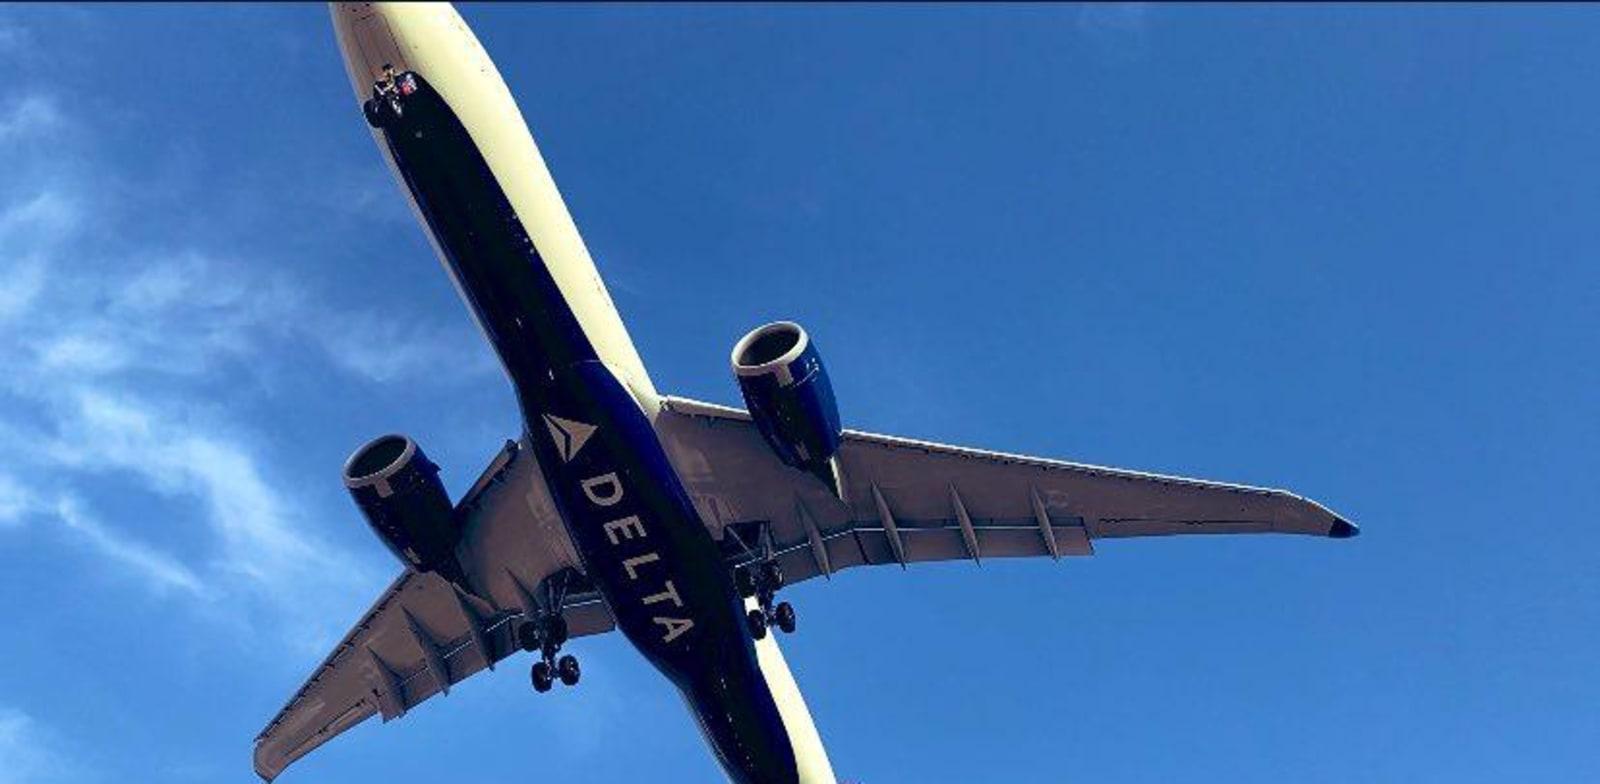 מטוס של דלתא איירליינס / צילום: מיכל רז-חיימוביץ'